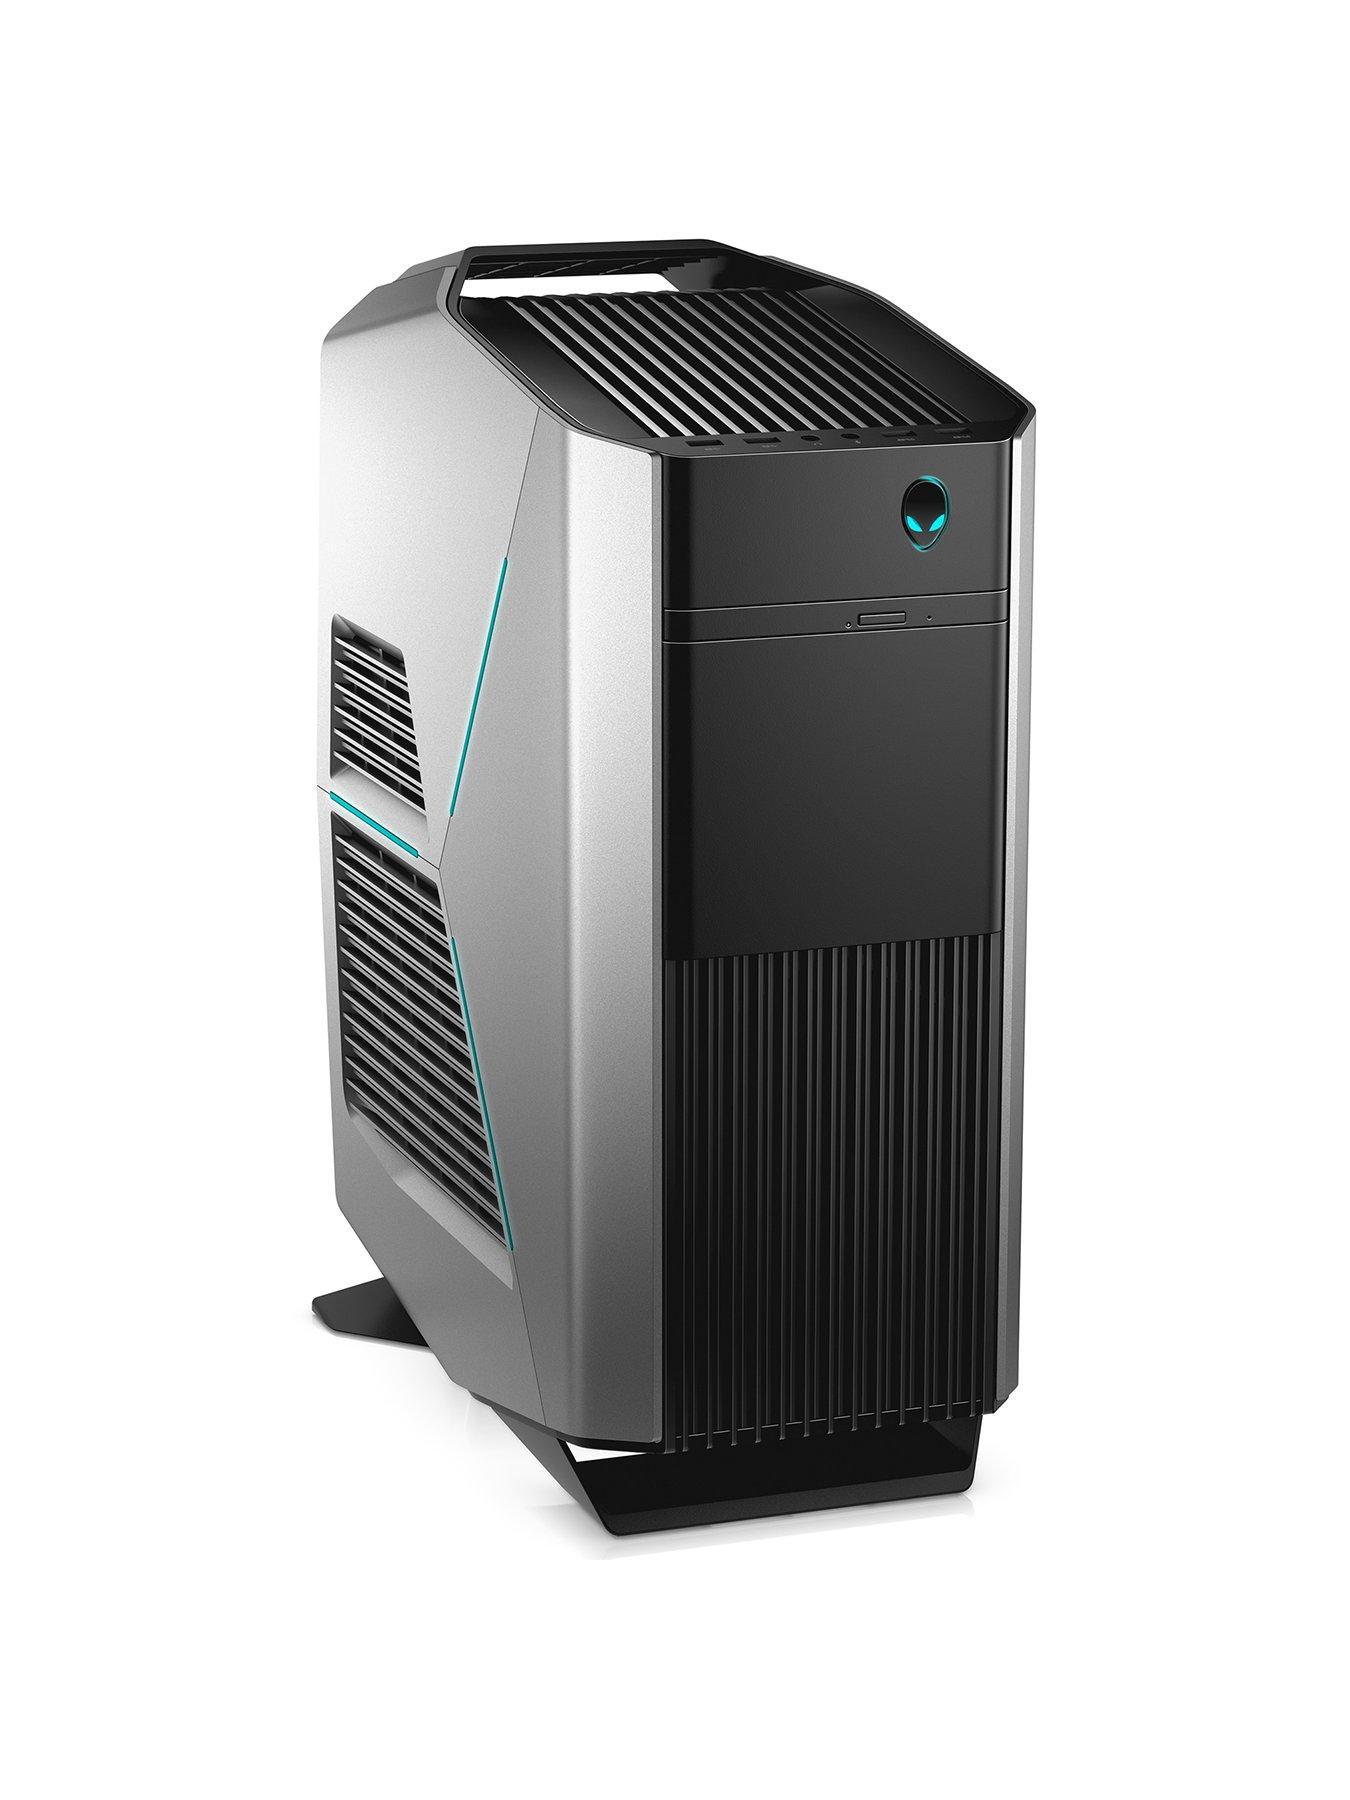 Alienware Aurora R7, Intel® Core™ i7-8700 Processor, 16GbDDR4 RAM, 1TbHDD & 16GbIntel® Optane™, Gaming PC with 6GbNVIDIA GeForce GTX 1060 Graphics